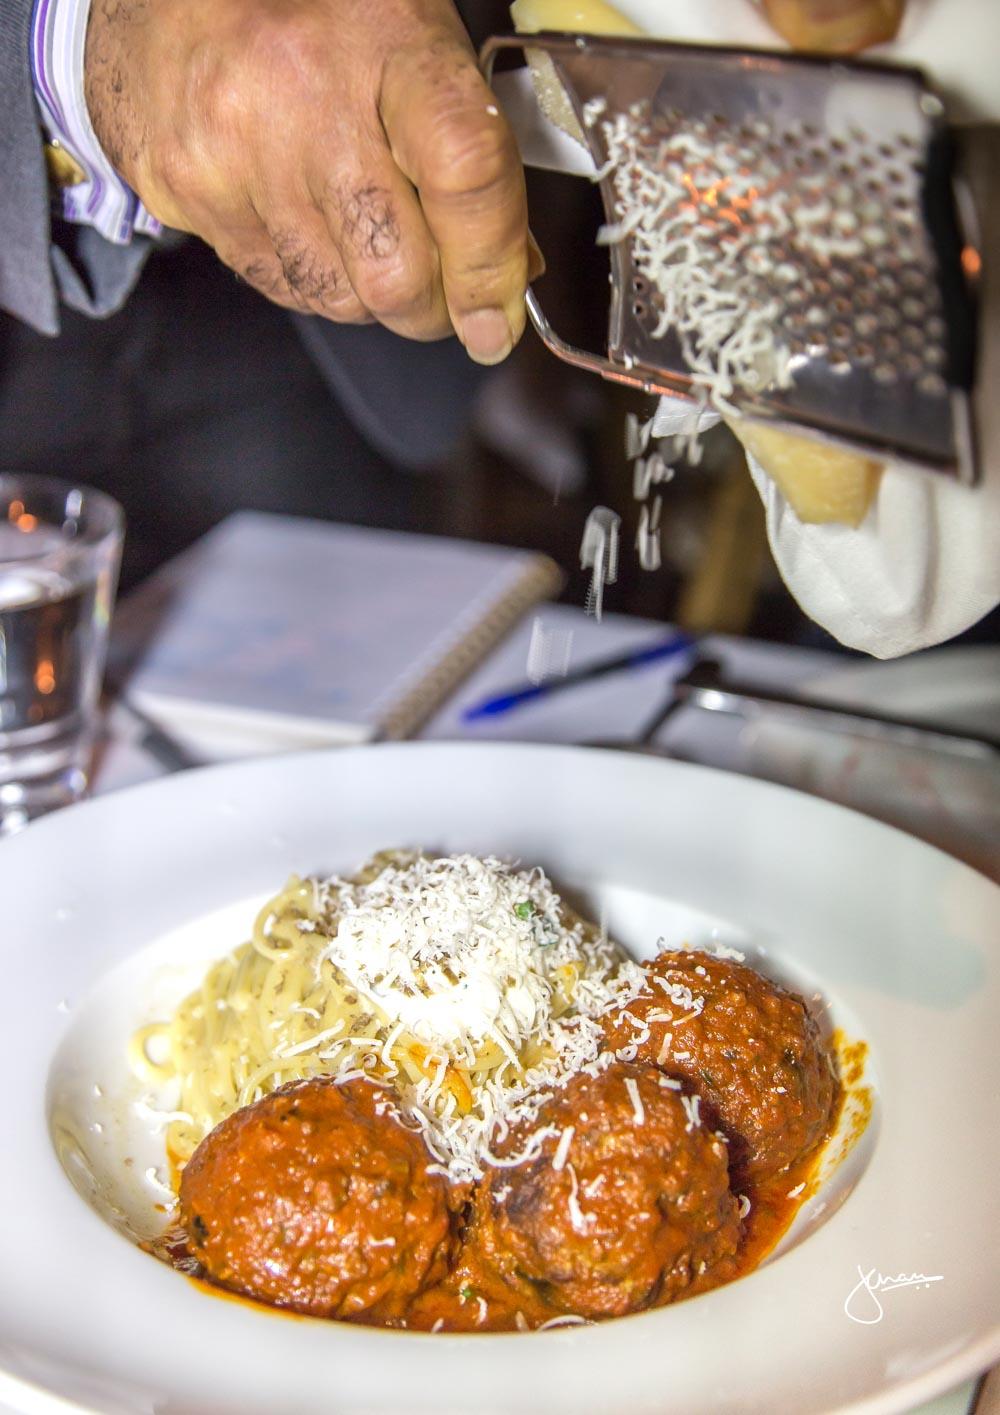 Truffle Spaghetti with Meatballs